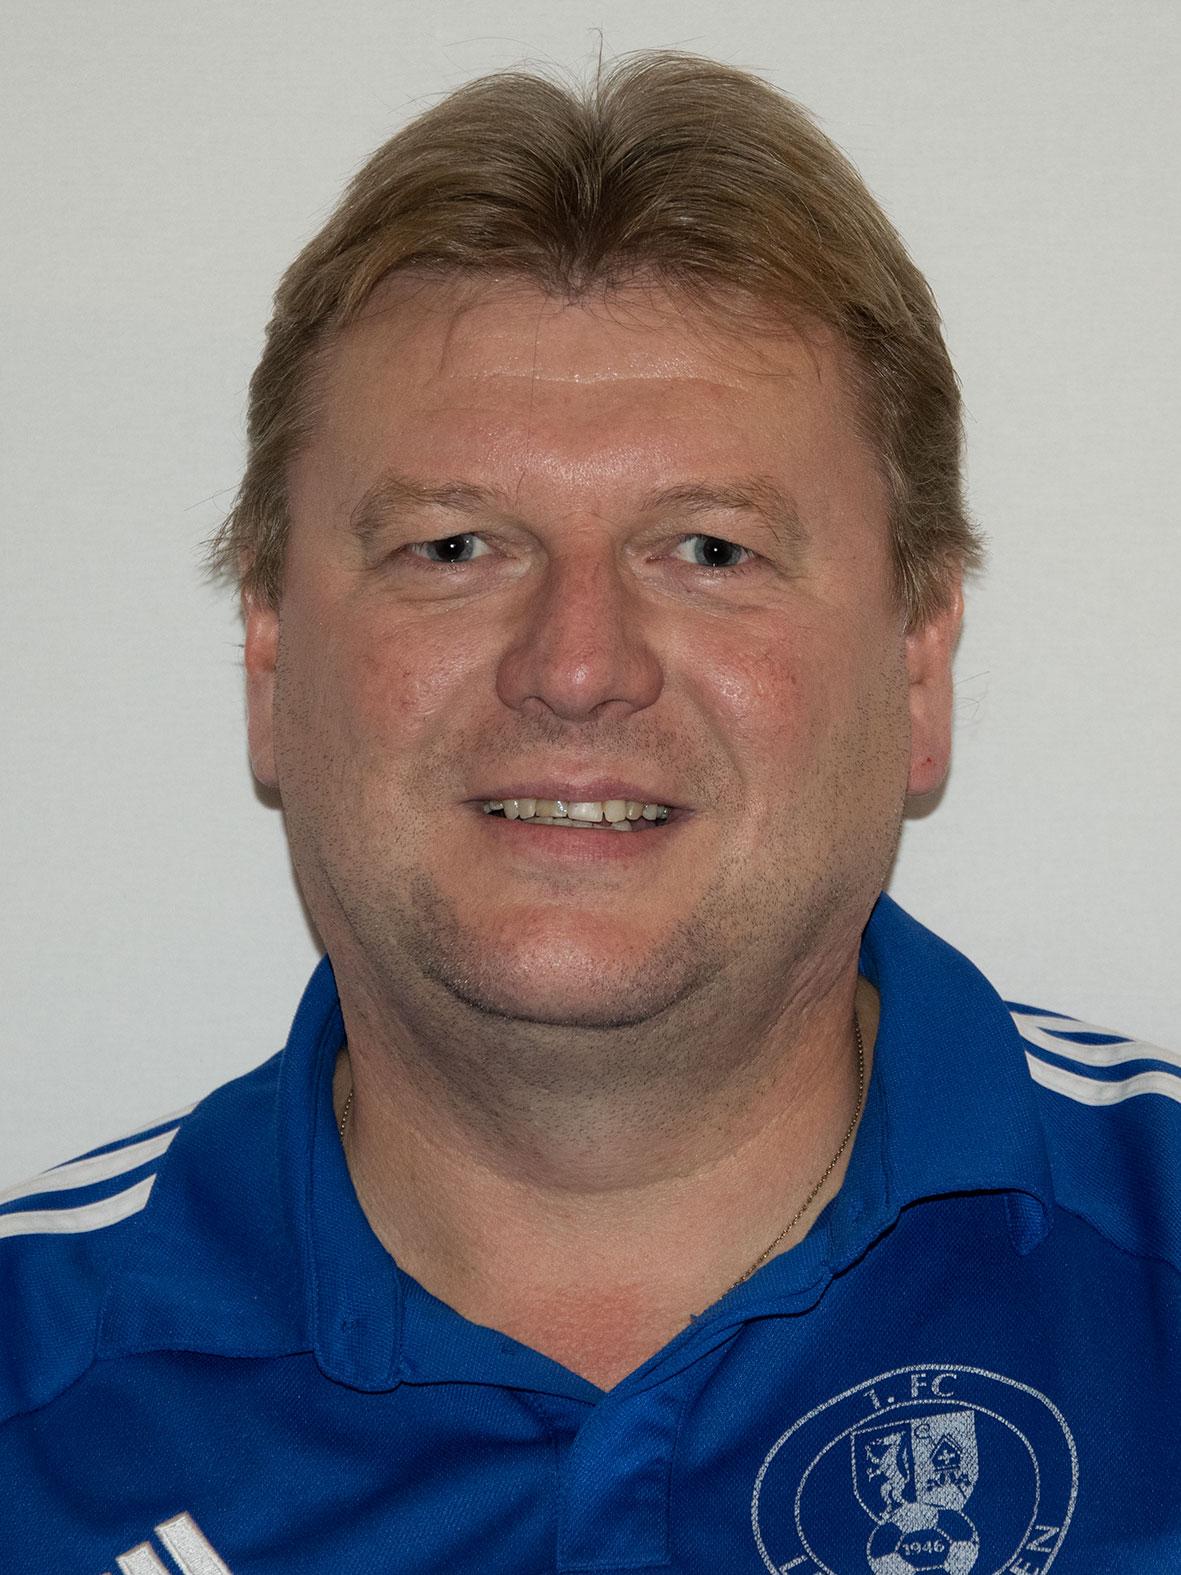 Karl Übelacker